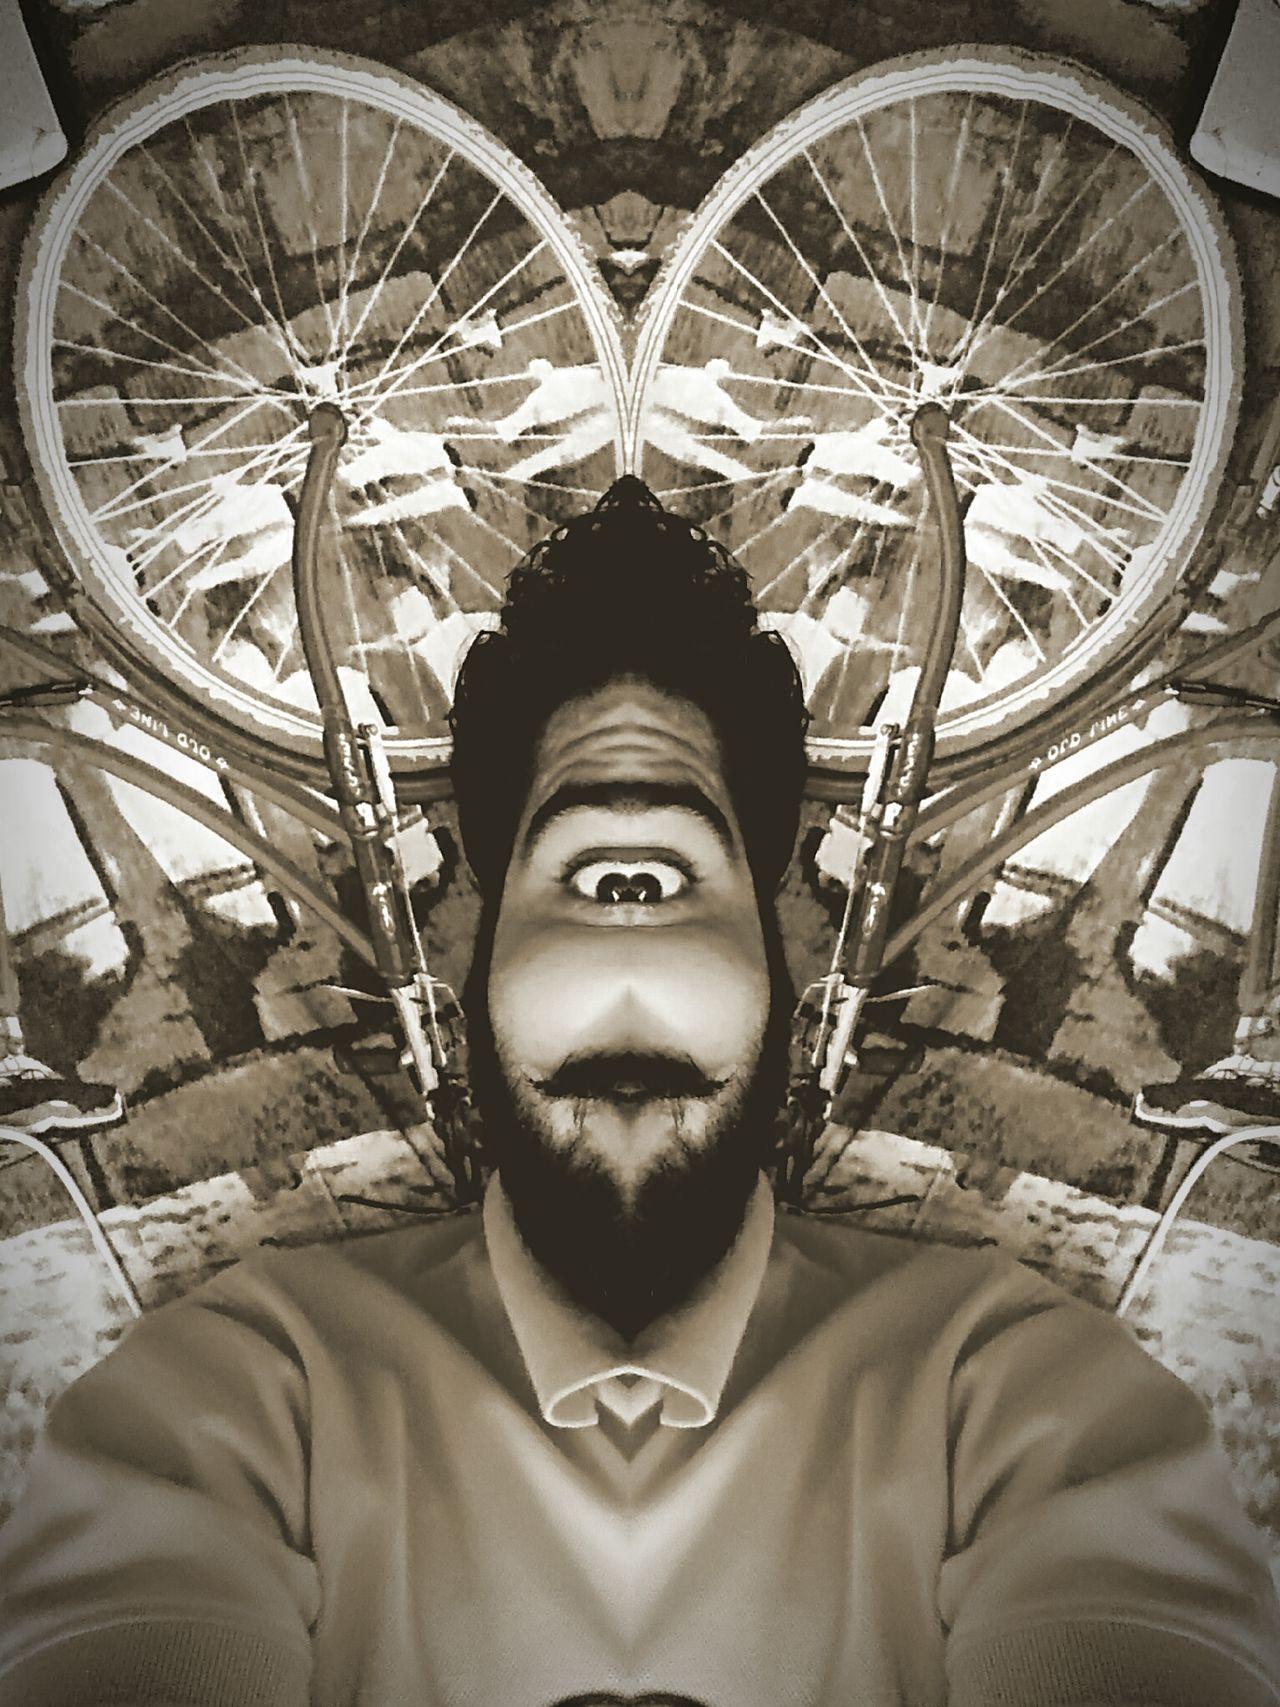 Bicycle Single Eye Creative Photography Creative Shots EyeEm EyeEmNewHere Wiered Creativity Textiles Patterns & Textures EyEmNewHere Sketch Art Portrait Front View Vintage Textured  Dark Highlighted EyeEm Best Shots Beared Eye Heart Mouth😘